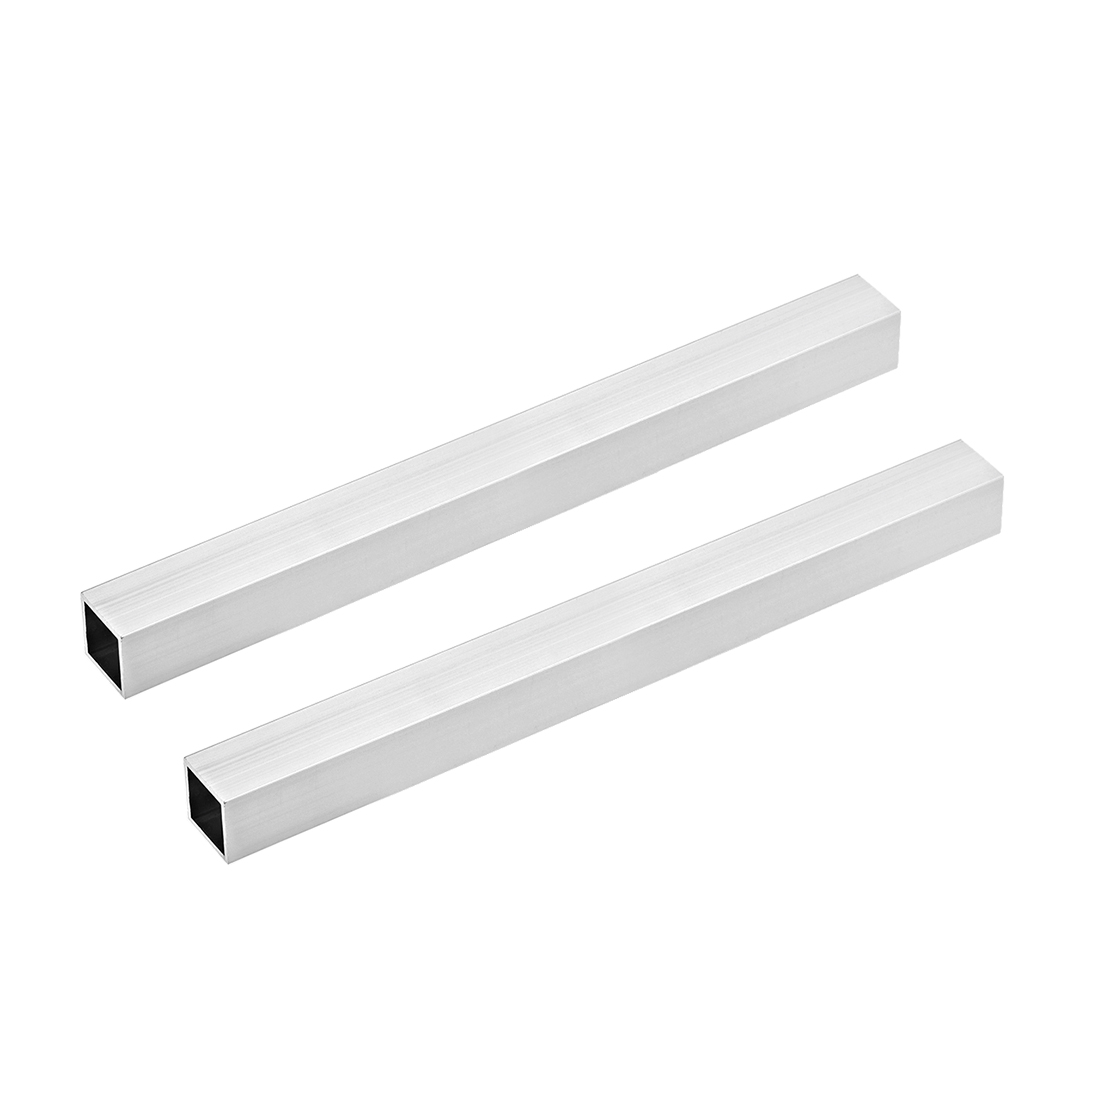 6063 Aluminum Square Tube 25mmx25mmx1.2mm Wall Thickness 300mm Long Tubing 2 Pcs